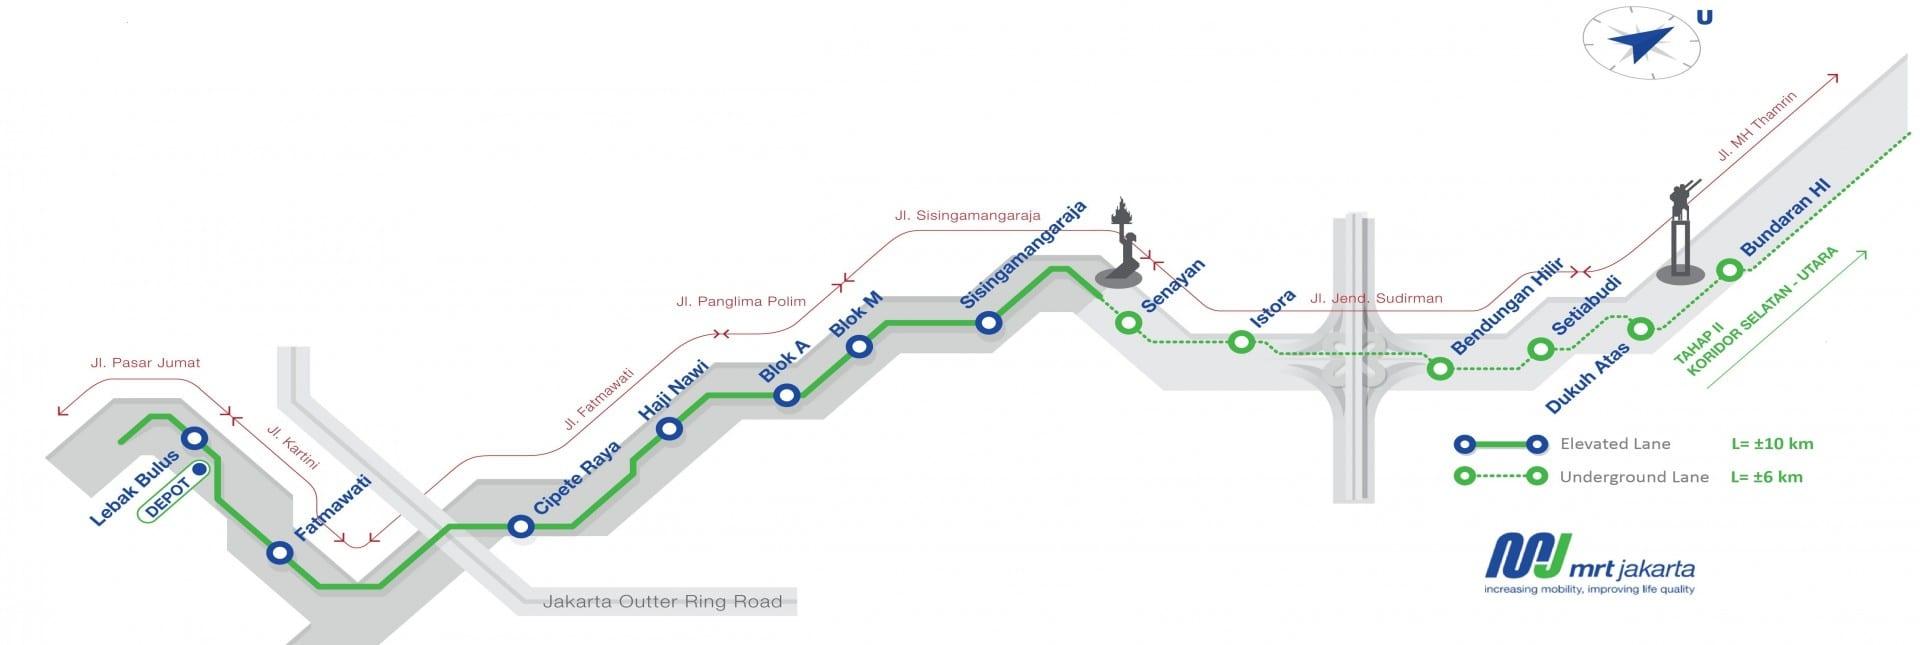 Prospek Properti di Jalur Kereta Cepat Jakarta Bandung, MRT & LRT 3 - Perencana Keuangan Independen Finansialku